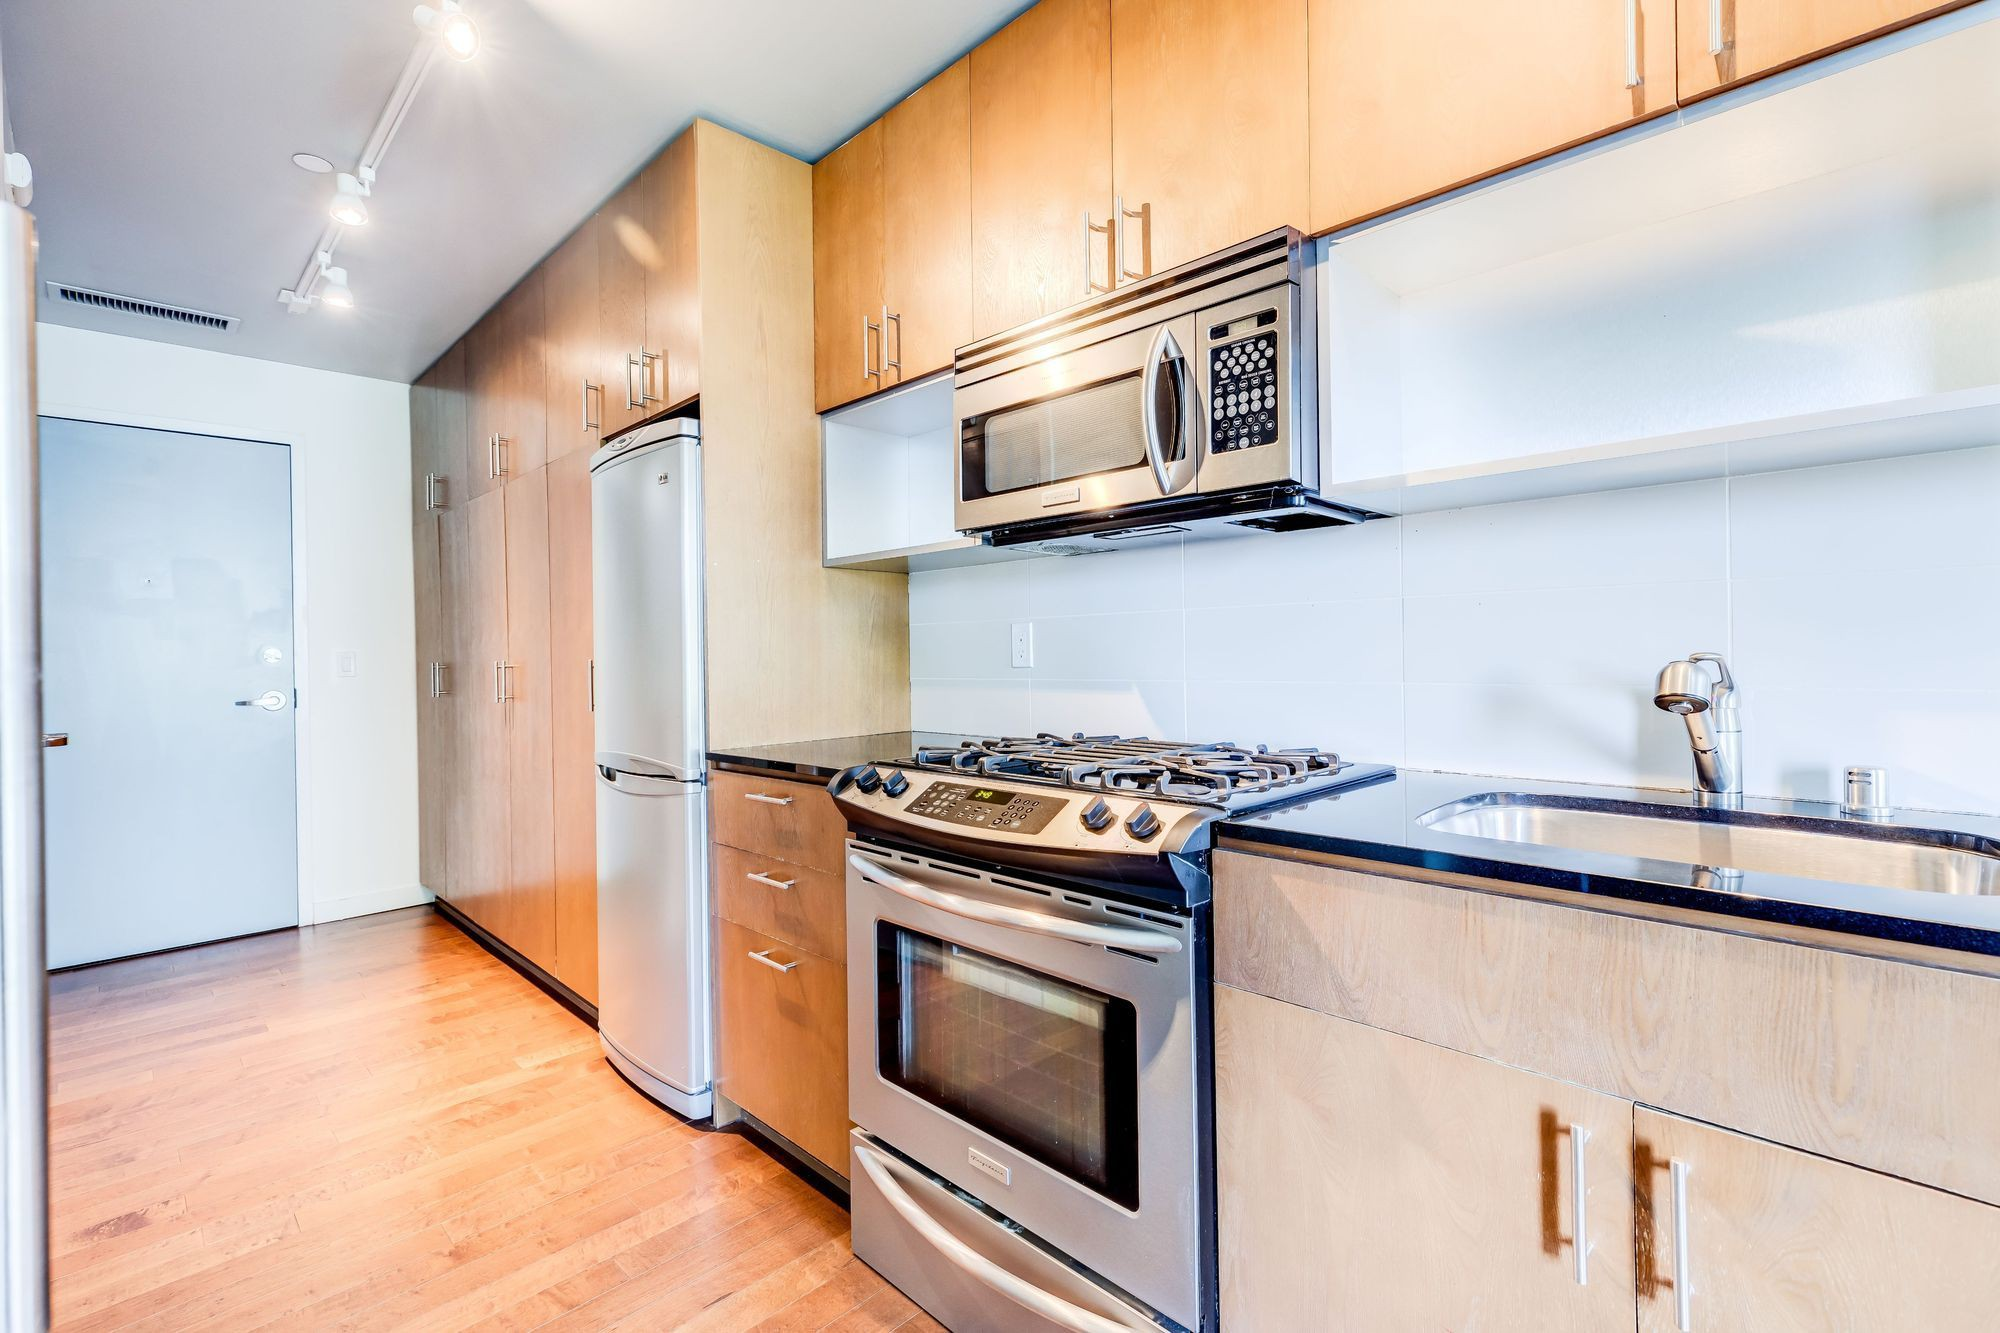 Apartments Near UW Marketside Flats for University of Washington Students in Seattle, WA